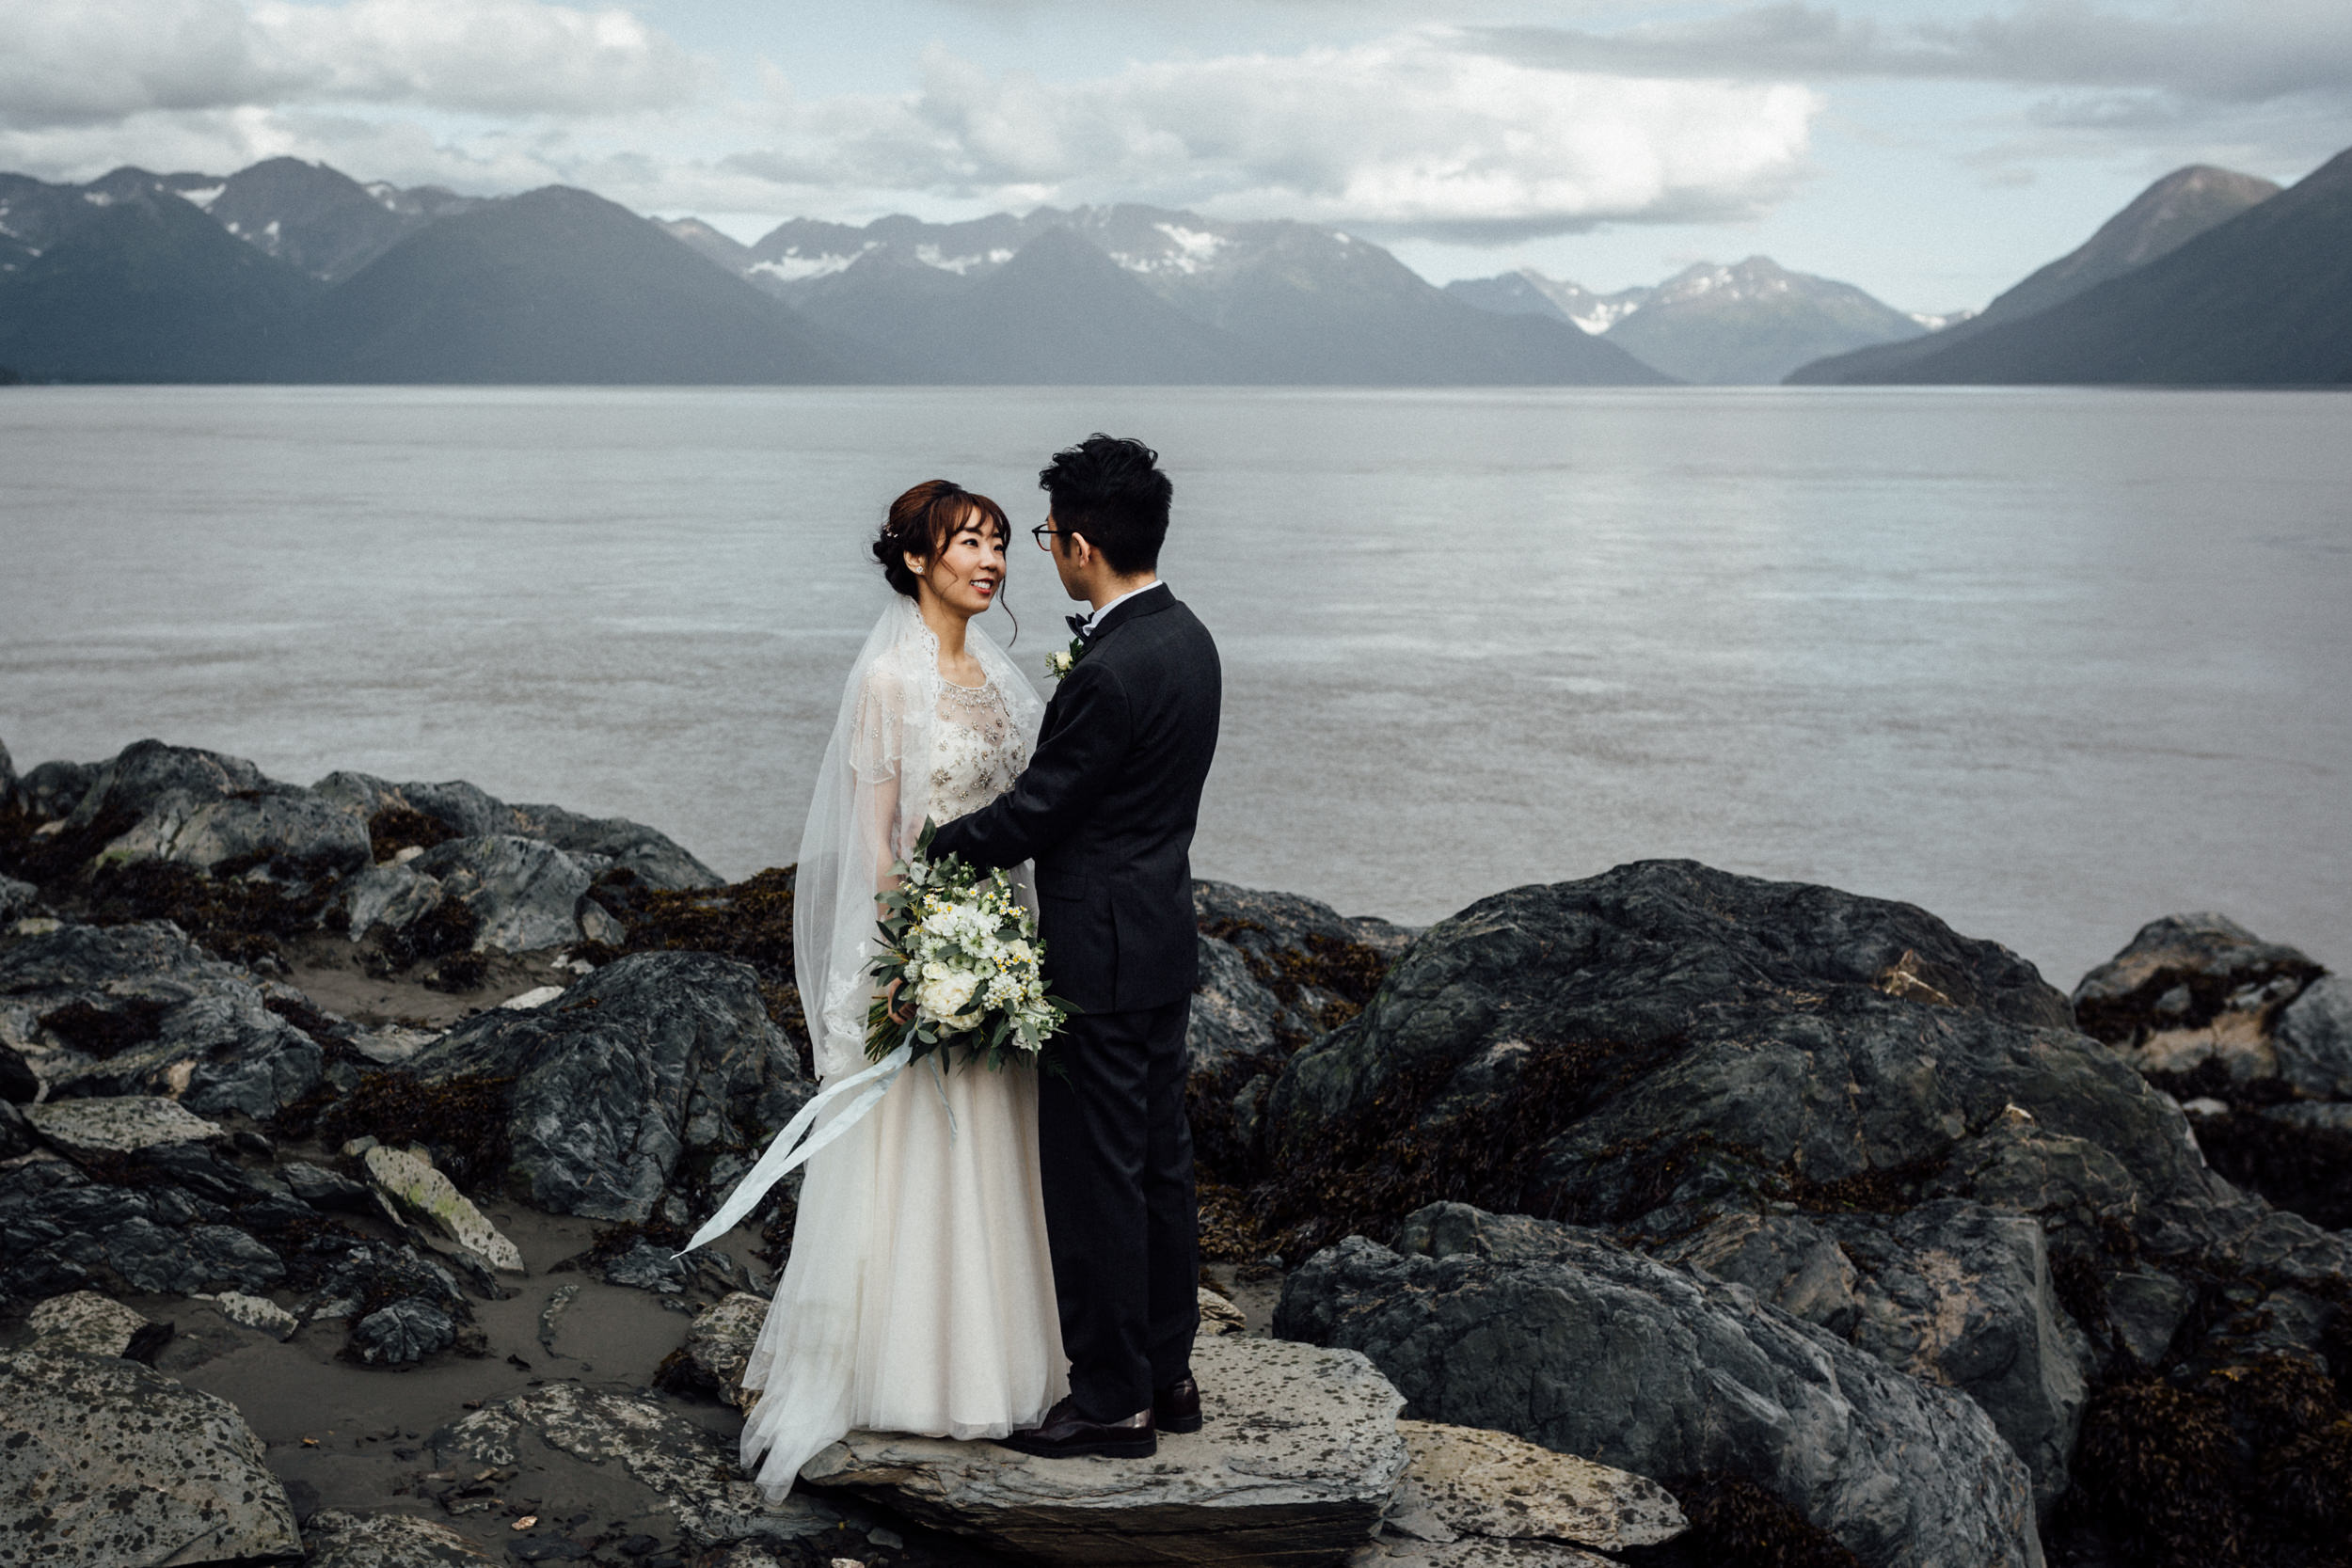 Couple eloping in Alaska in summertime